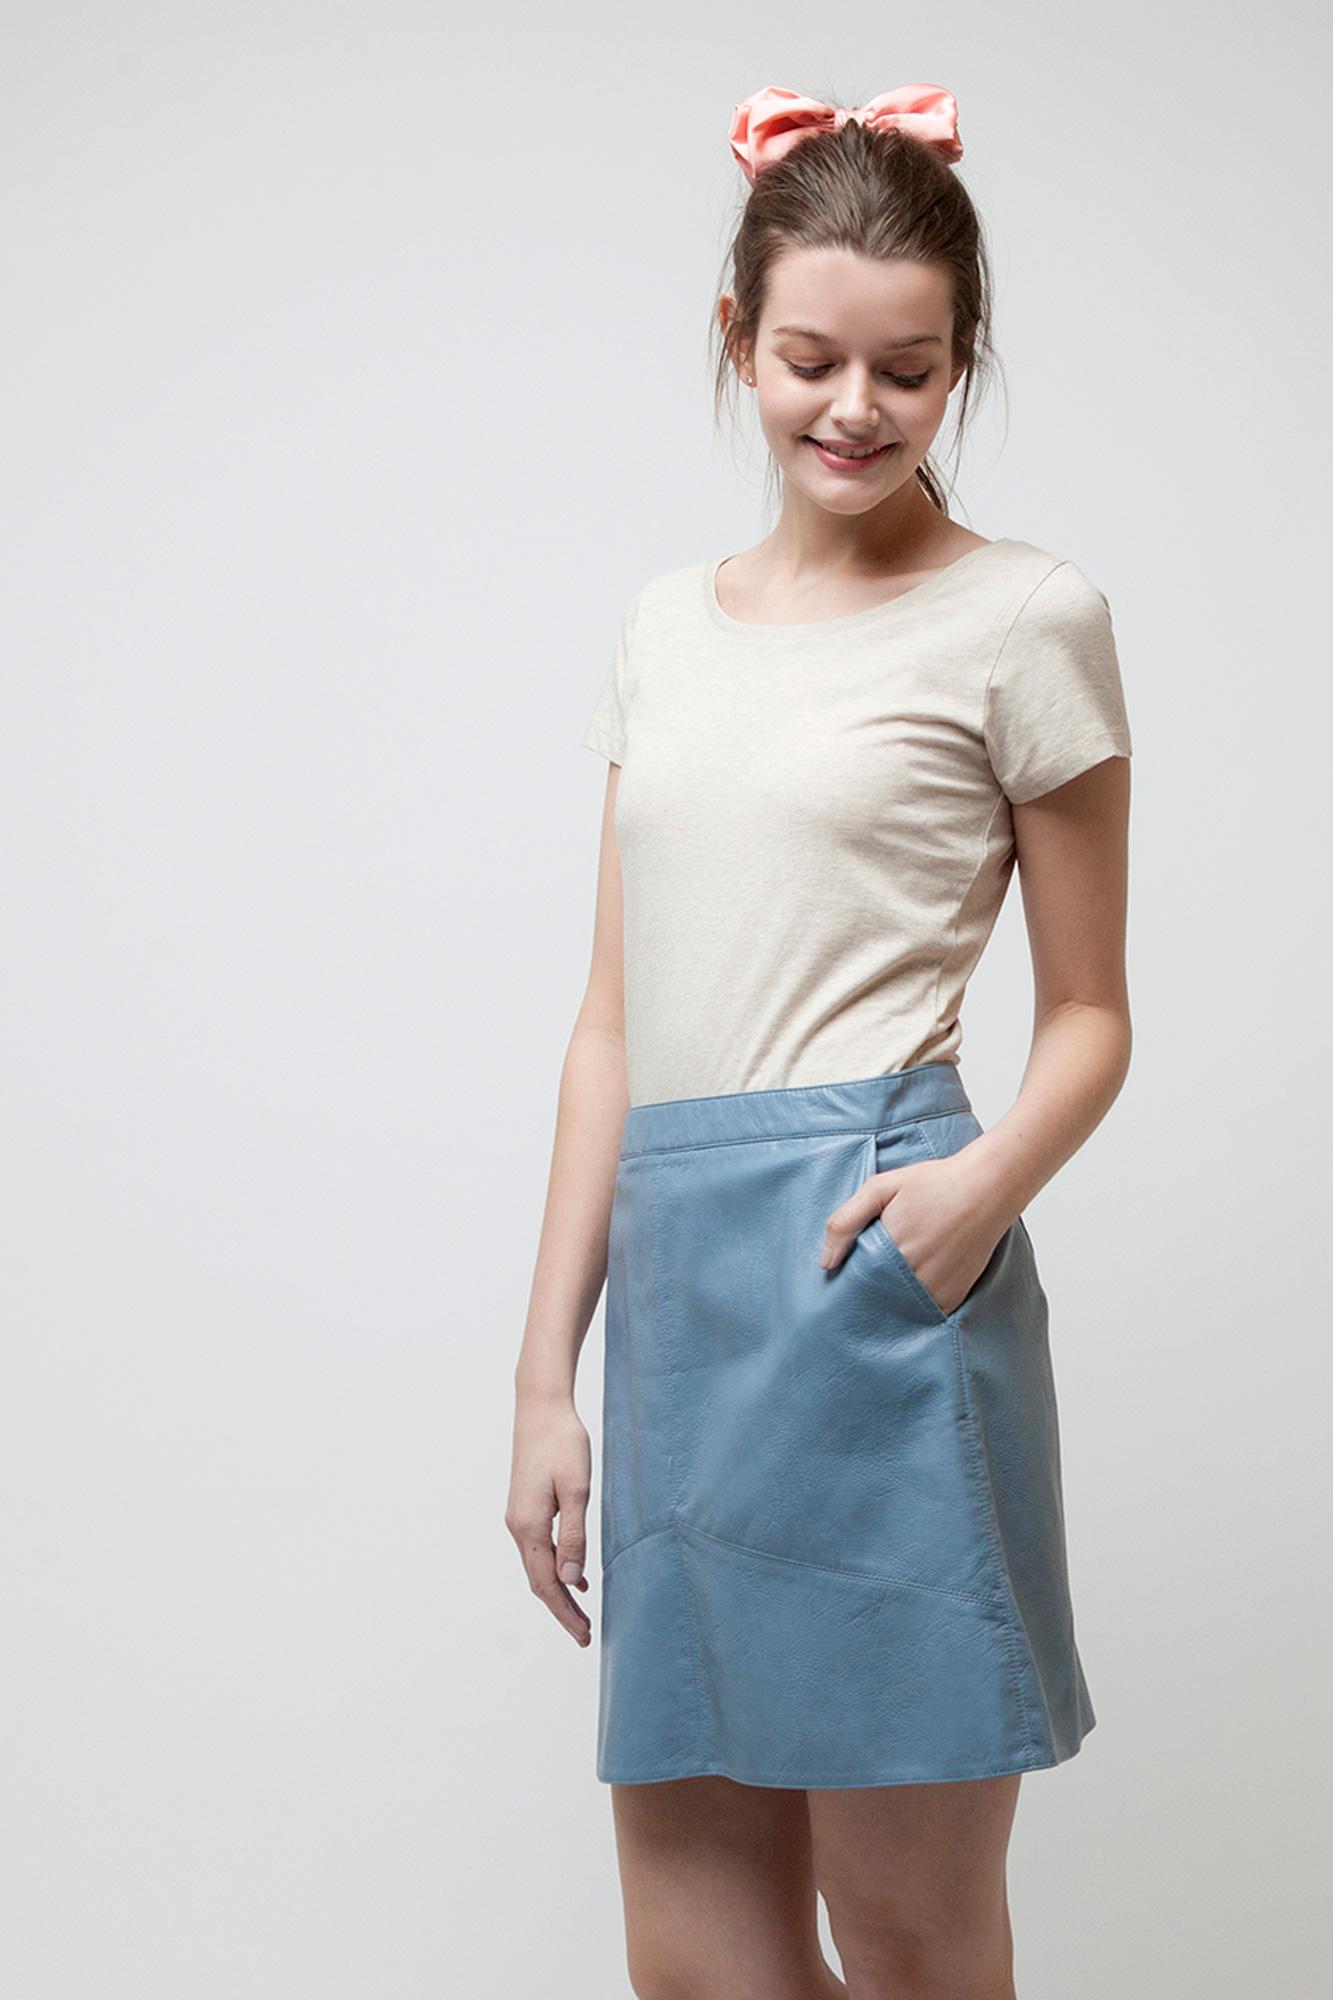 W-STTW028-T-Shirt-Basic-Naturmode-Mid-Heather-Beige-Detail